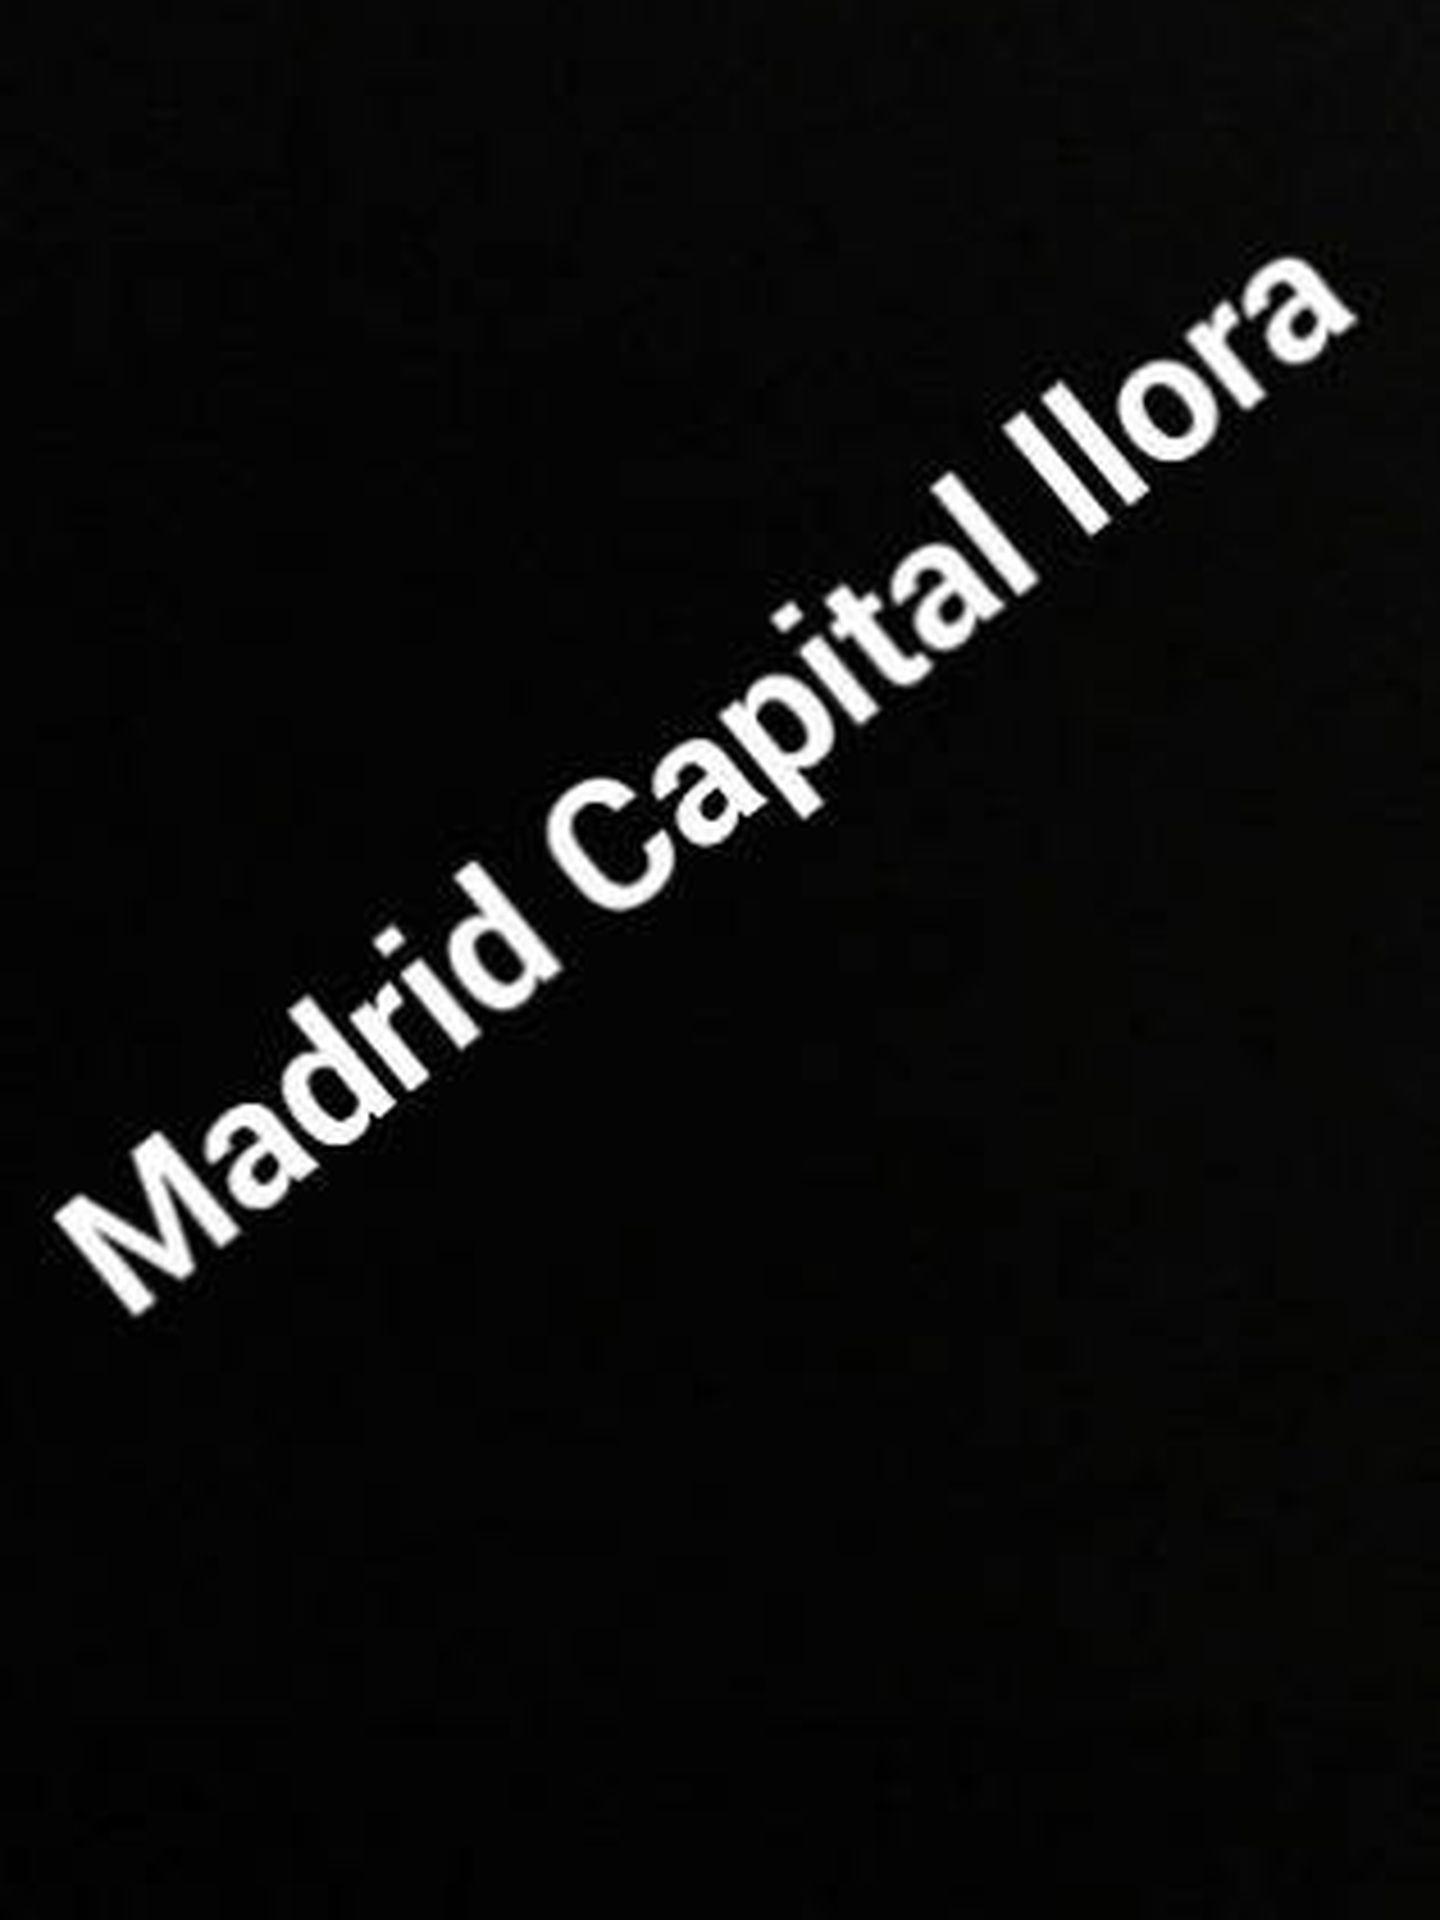 Publicación de Carla Vigo. (Instagram: @reinadelentejuelas)